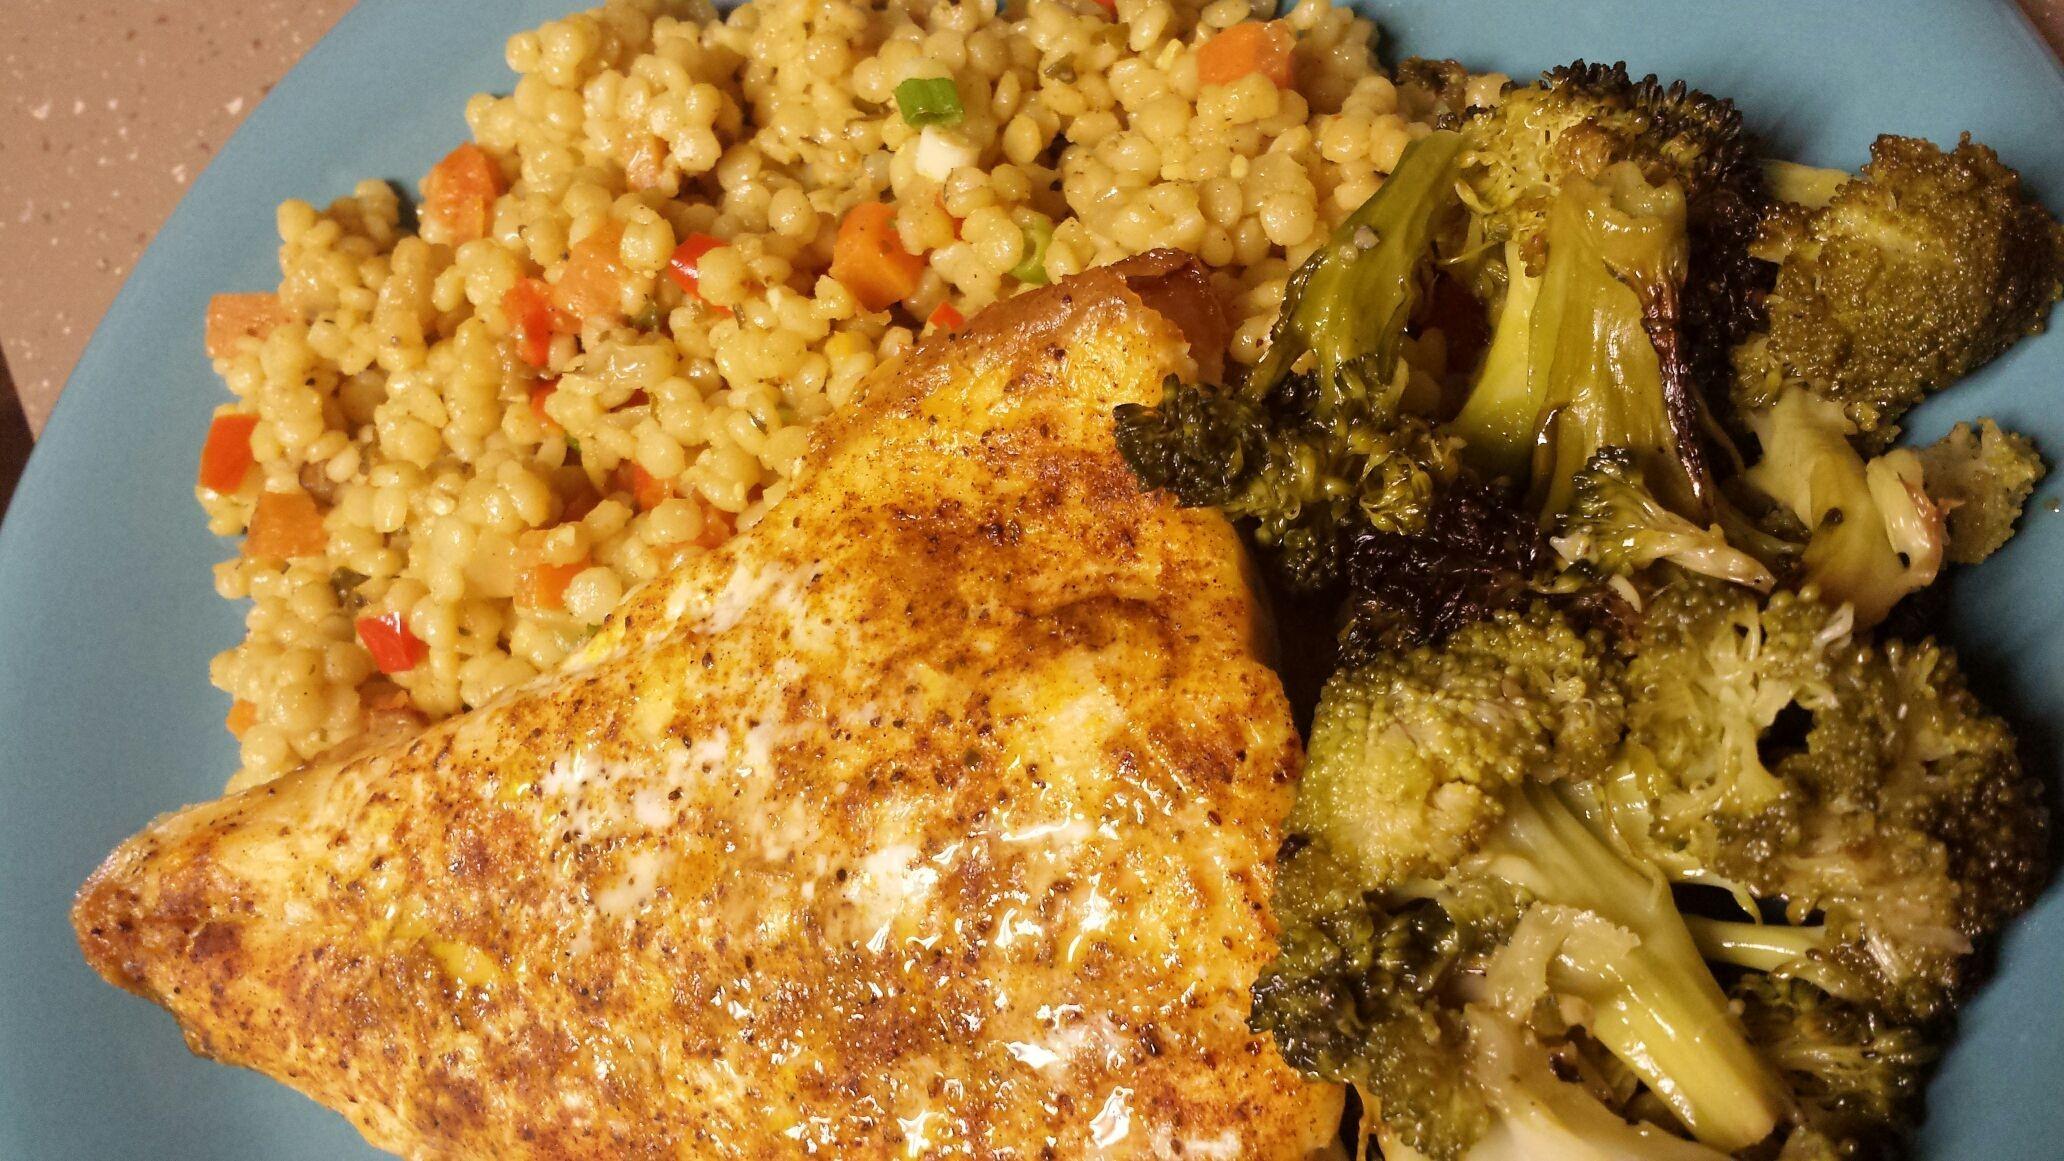 Dinner plate #broccoli #articchar #couscous #foodpic #foodgasm #foodporn #foodie #foodpedia #foodhunter #foodbloggers #eatwell #eathealthy #healthyeats #healthyfood #healthyeating #realfood #detroitfoodnetwork #detroitfoodie #detroitfood #delish #delicious #deliciousfood #deliciousfoods #deliciousness #instafood #foodnetwork #owntv #wholefoods #bestfoodworld #bestfood